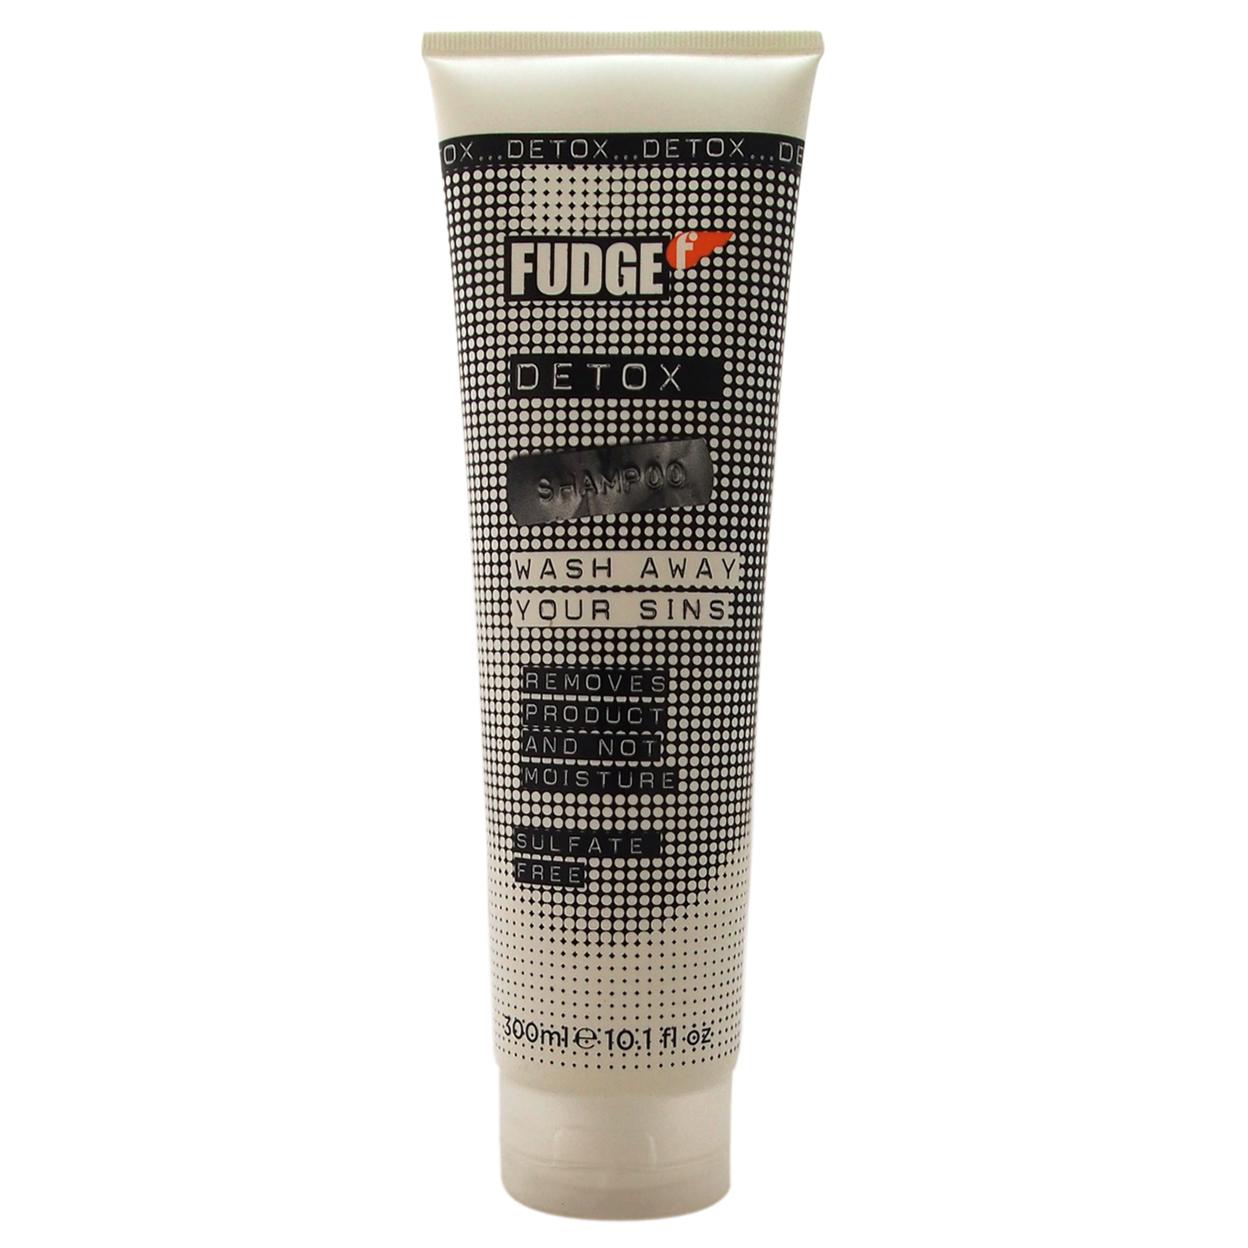 Detox Deep Cleanser by Fudge for Unisex - 10.1 oz Cleanser 56d0b8d4a3771ca61b8ba096